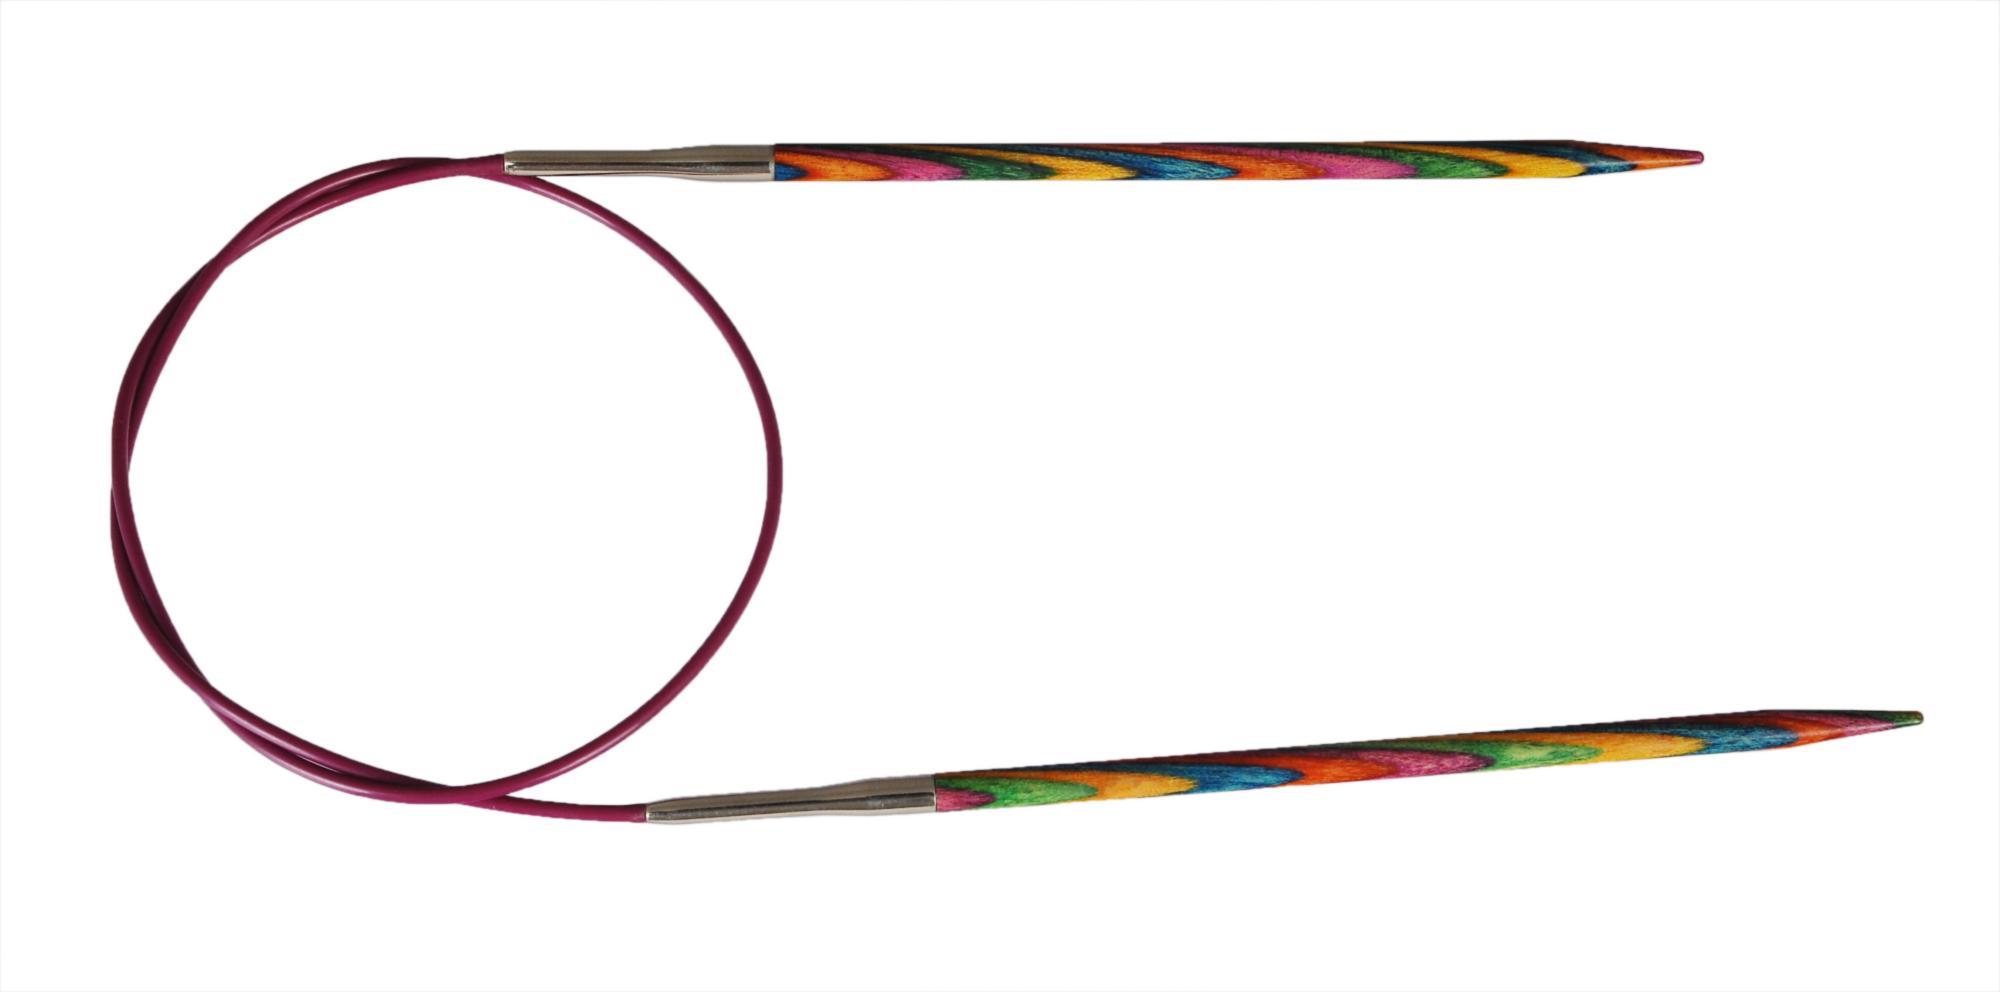 Спицы круговые 50 см Symfonie Wood KnitPro, 20386, 3.25 мм